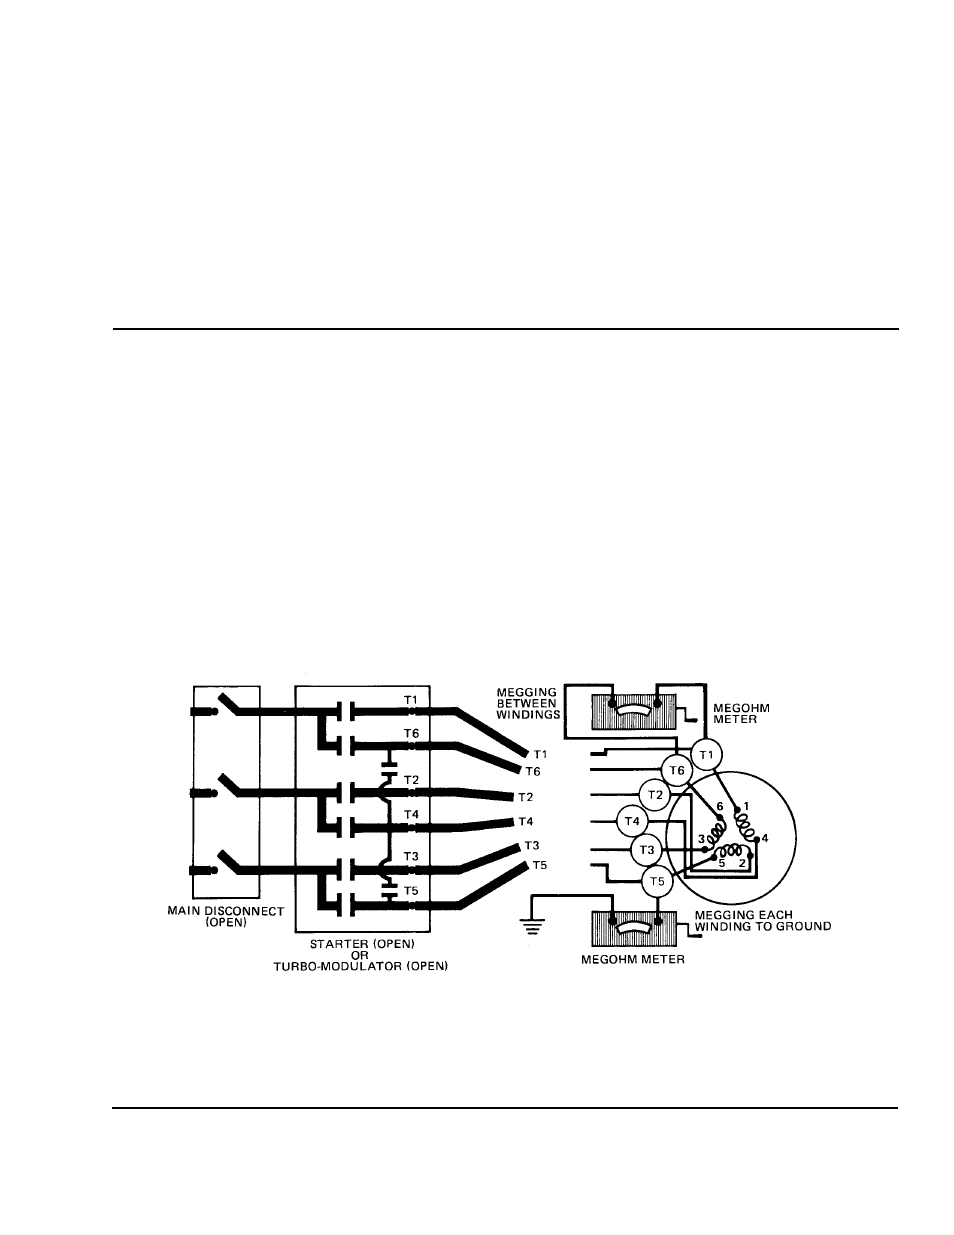 megging a motor - impremedia.net york heat pump wiring schematics